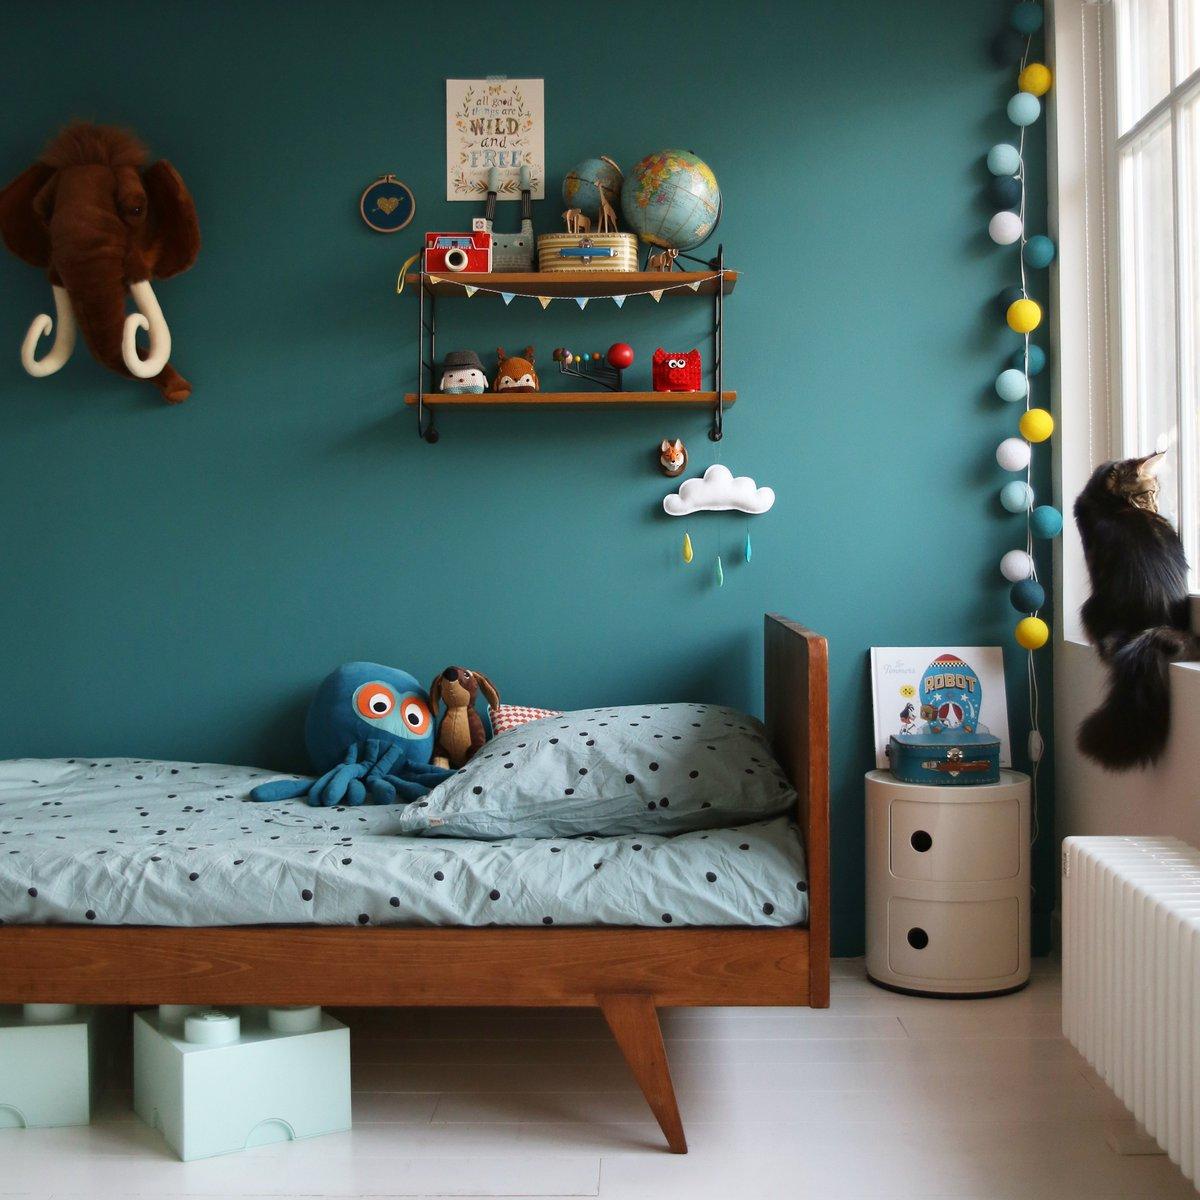 jesus sauvage jesussauvage twitter. Black Bedroom Furniture Sets. Home Design Ideas